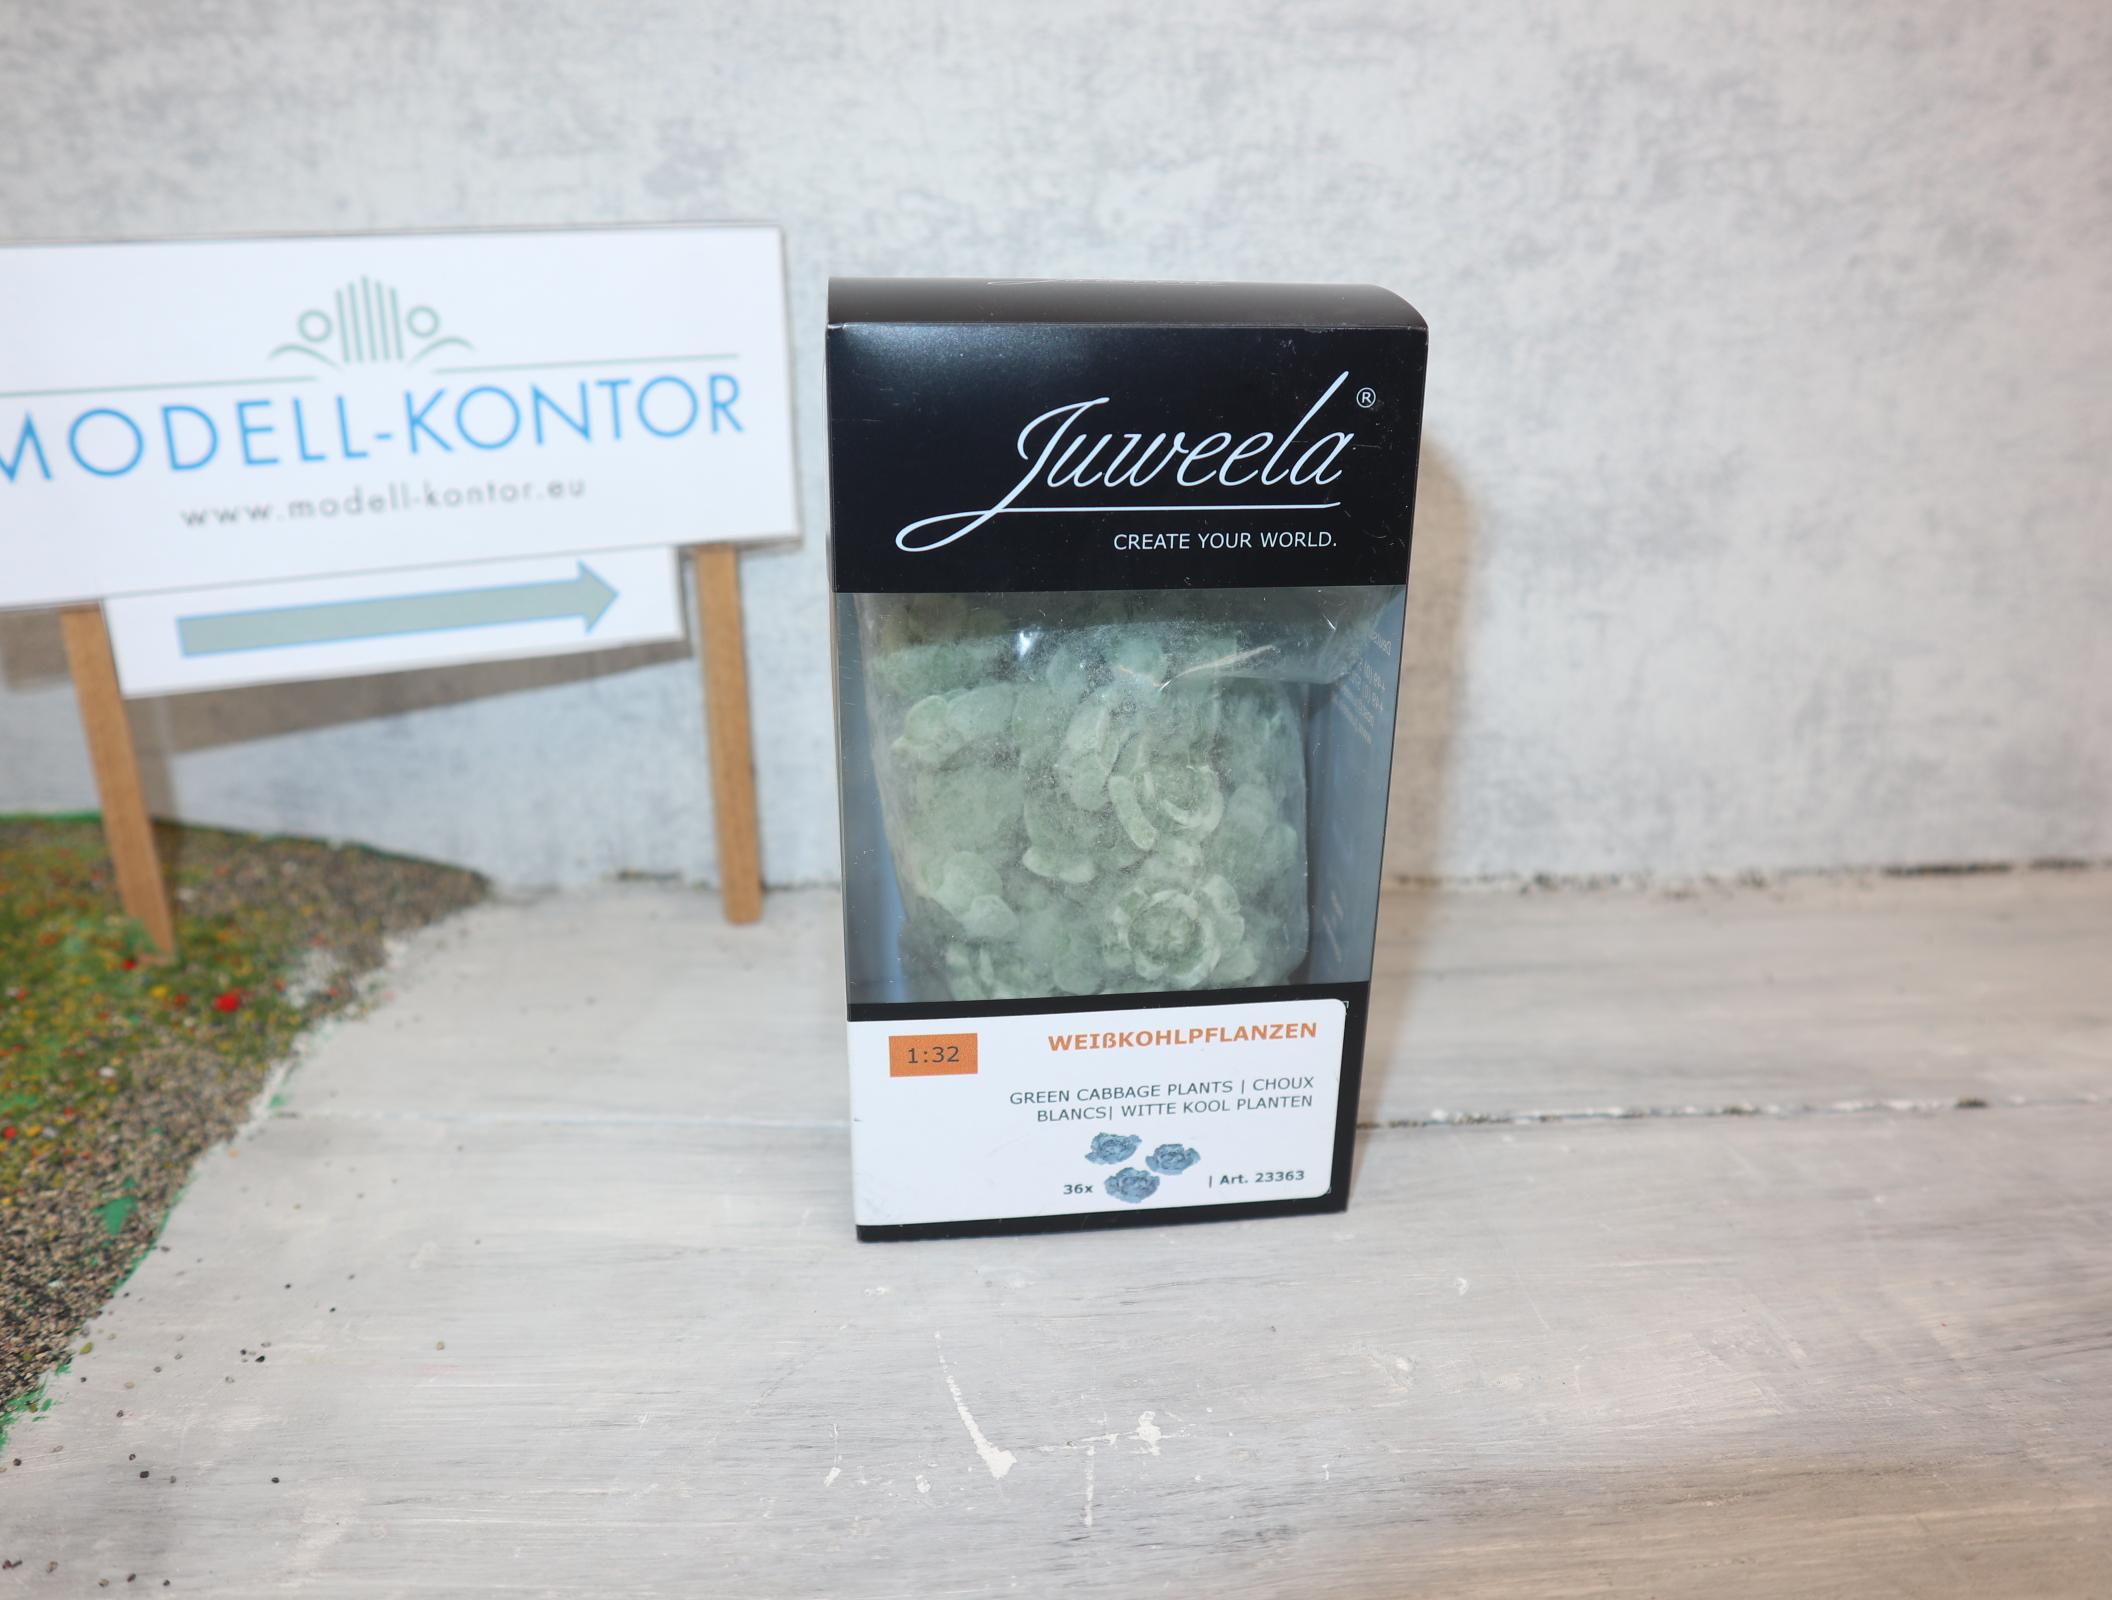 Juweela 23363 in 1:32 Weißkohlpflanzen (36 Stück) in OVP